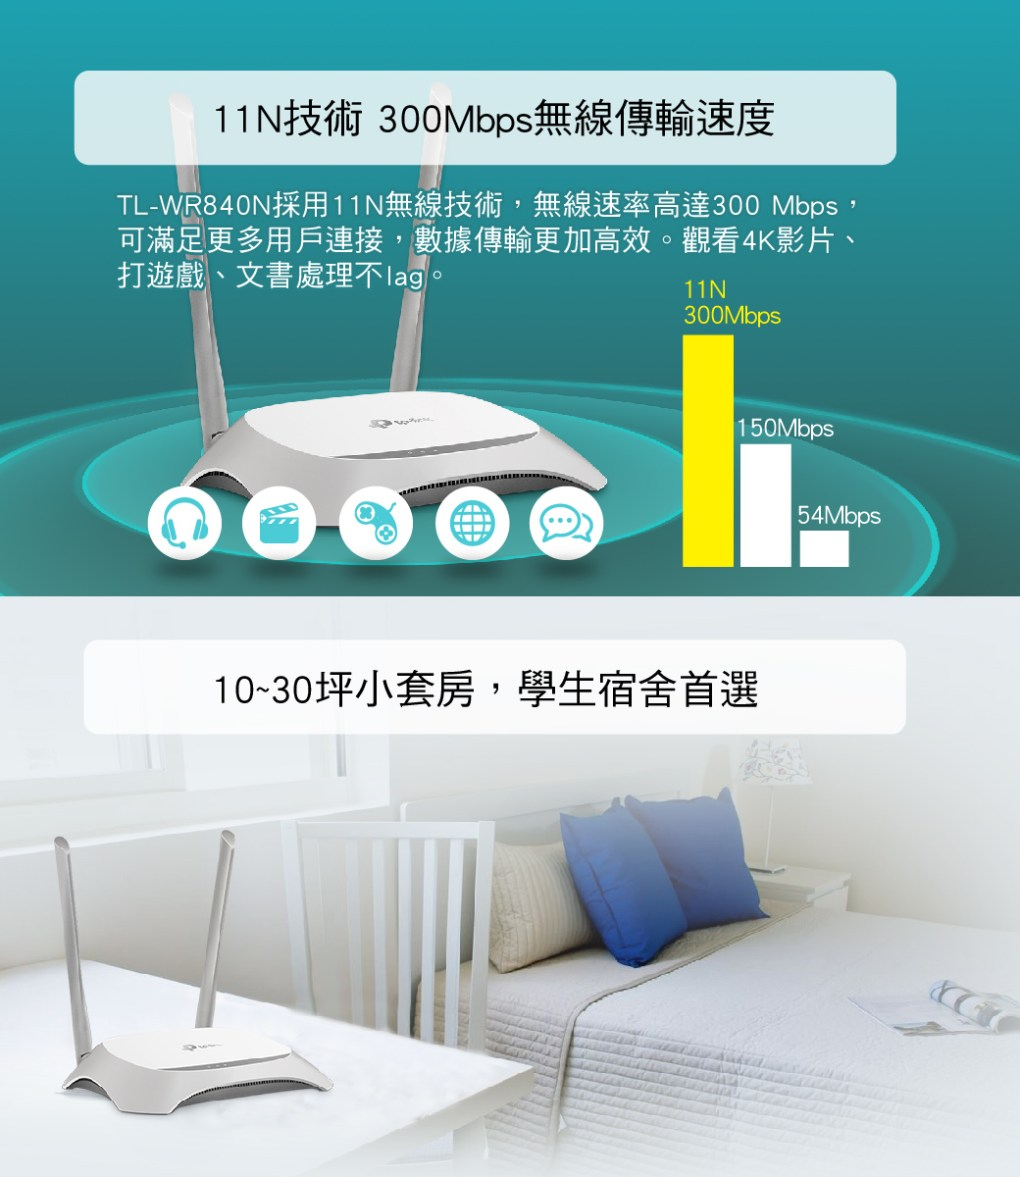 TP-Link TL-WR840N 300Mbps 無線網路 WiFi 路由器(分享器) - TP Link TL WR840N 9